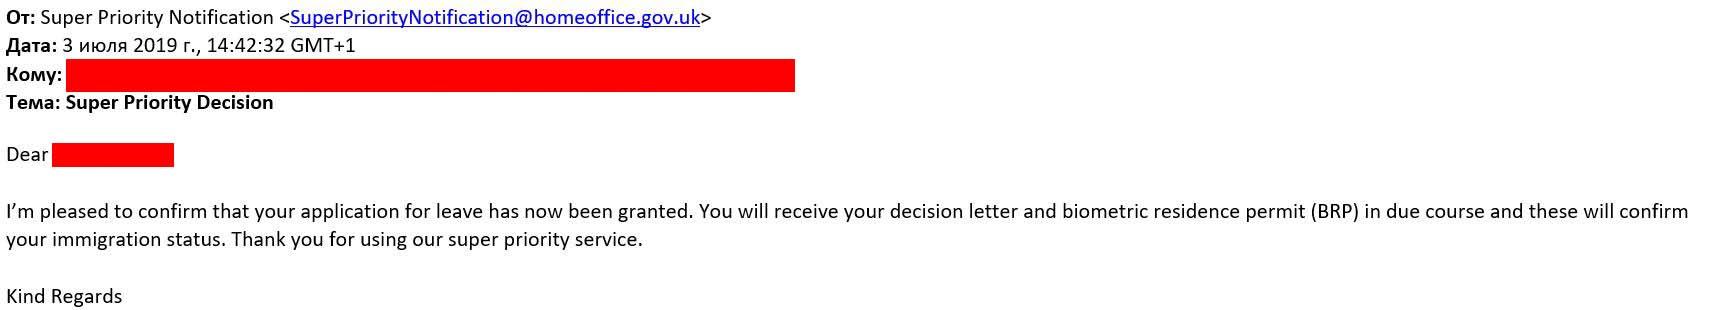 SETO_Discretionary_Leave_approved_Super_